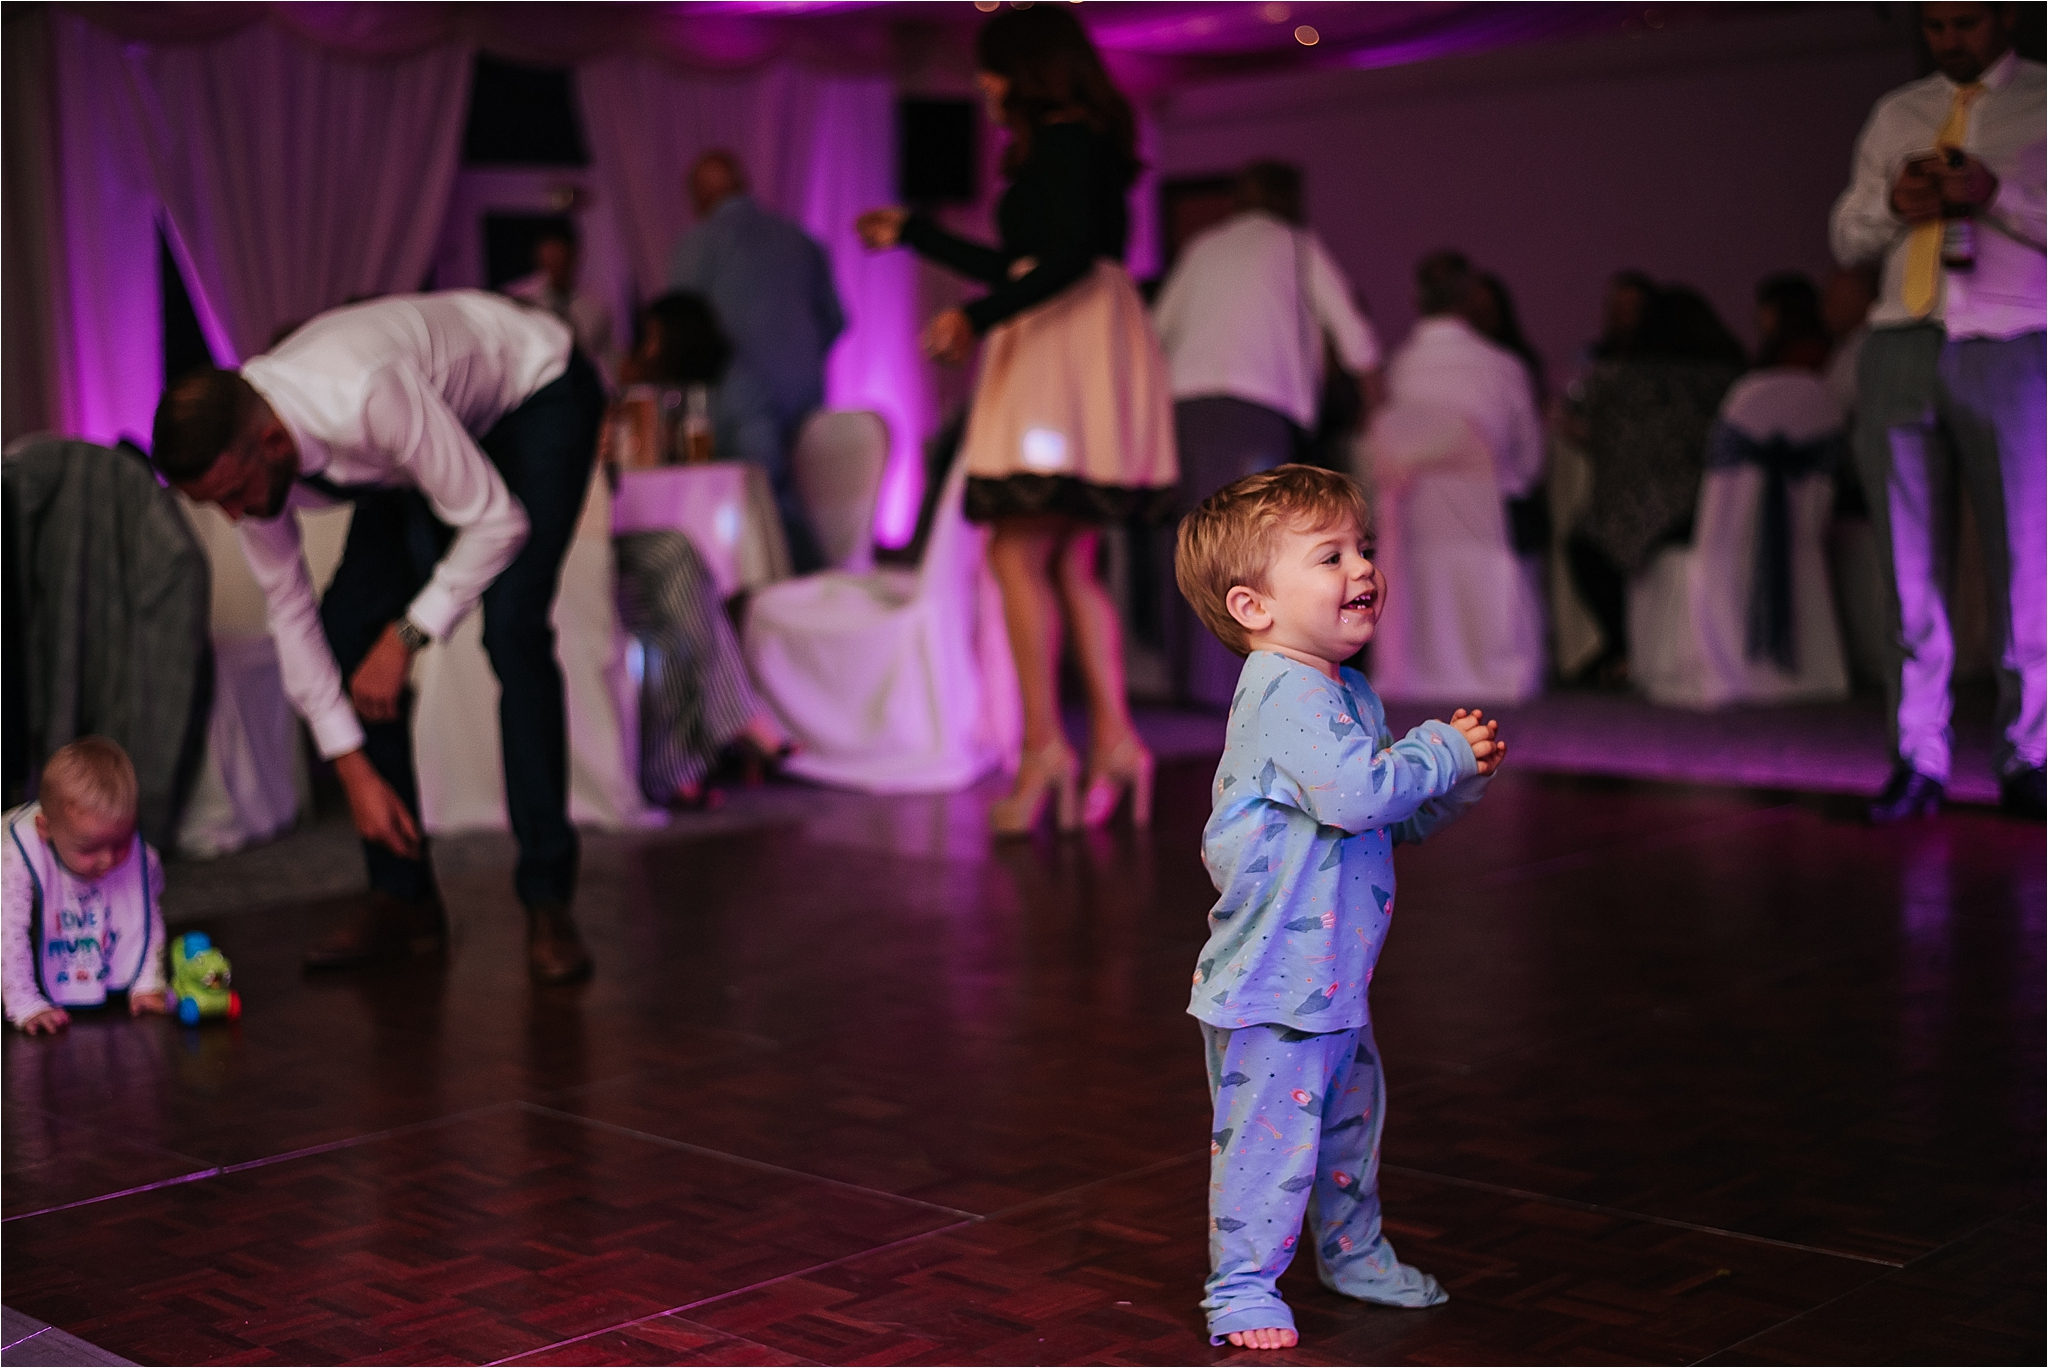 thevilla+lancashire+wreagreen+wedding+photographer77.jpg